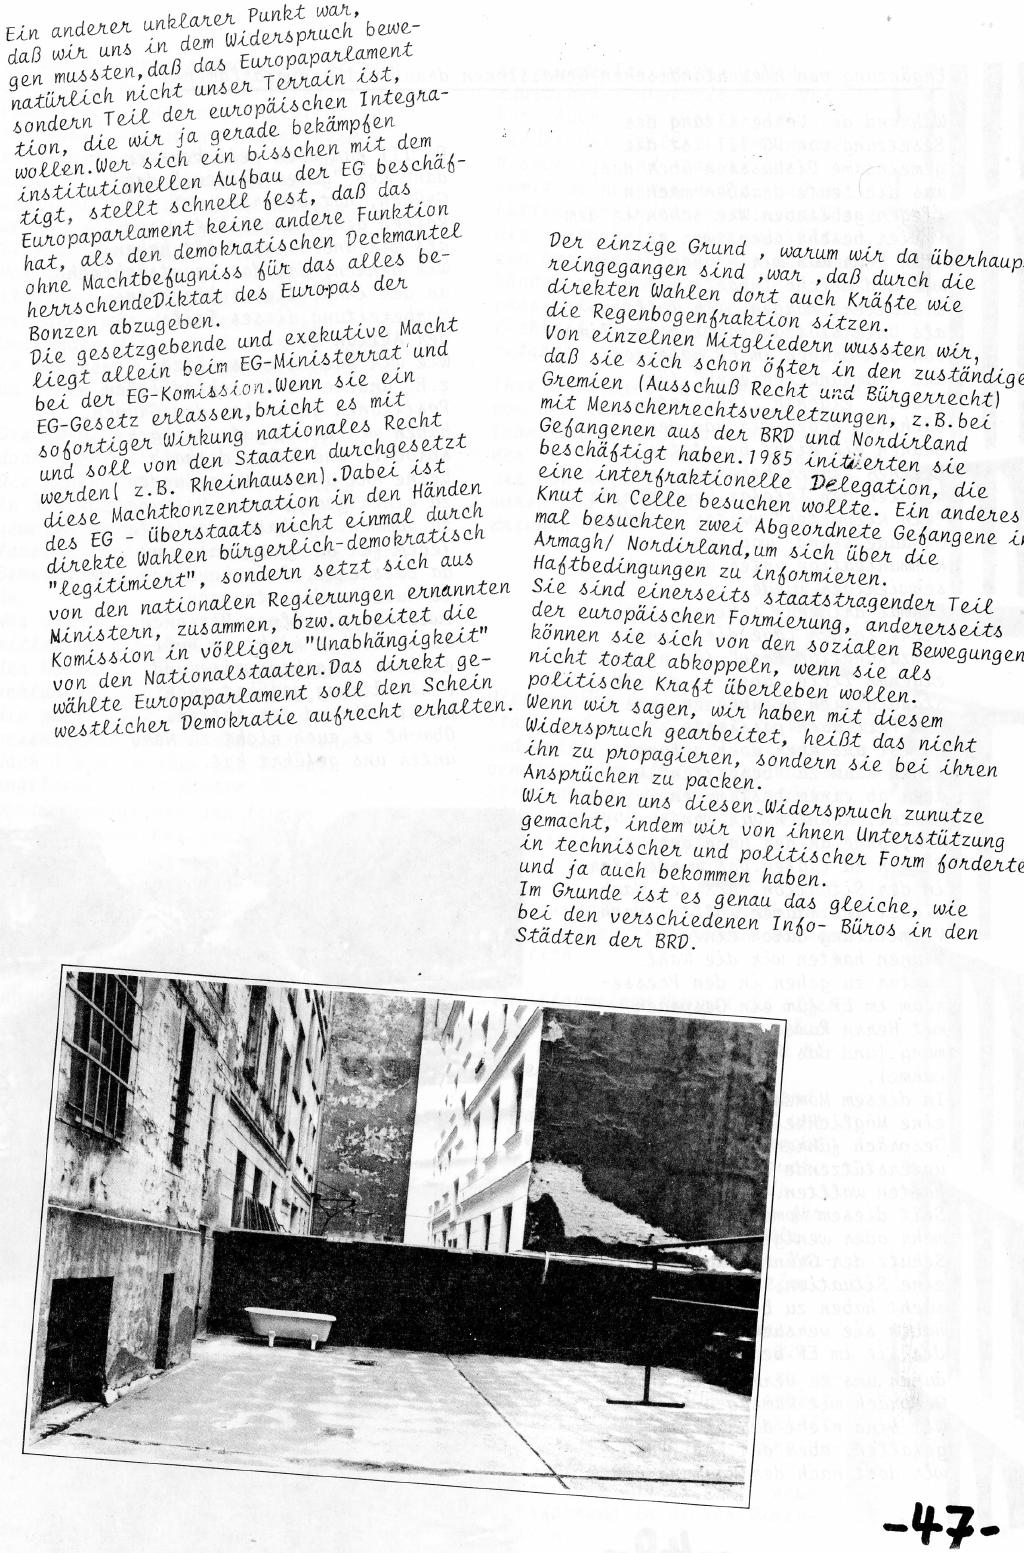 Belgien_Doku_Besetzung_EG_Kommission_1989_049